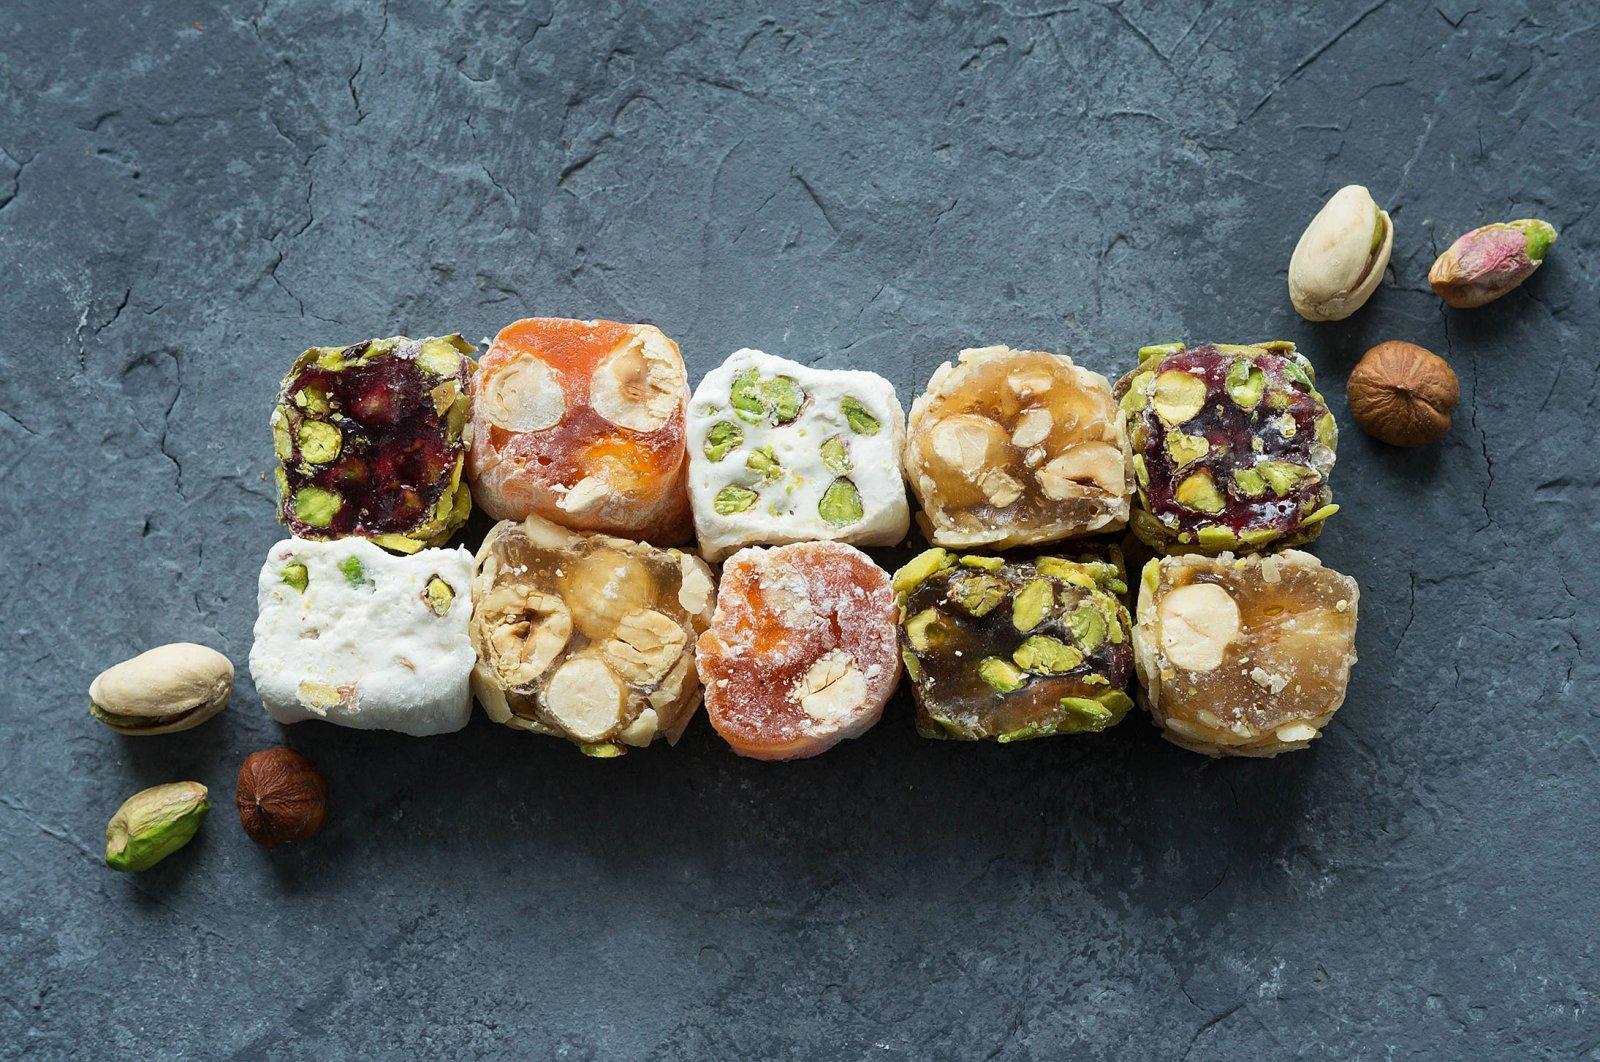 Eid Al-Fitr: Celebrating the 'Sugar Feast' with homemade candies